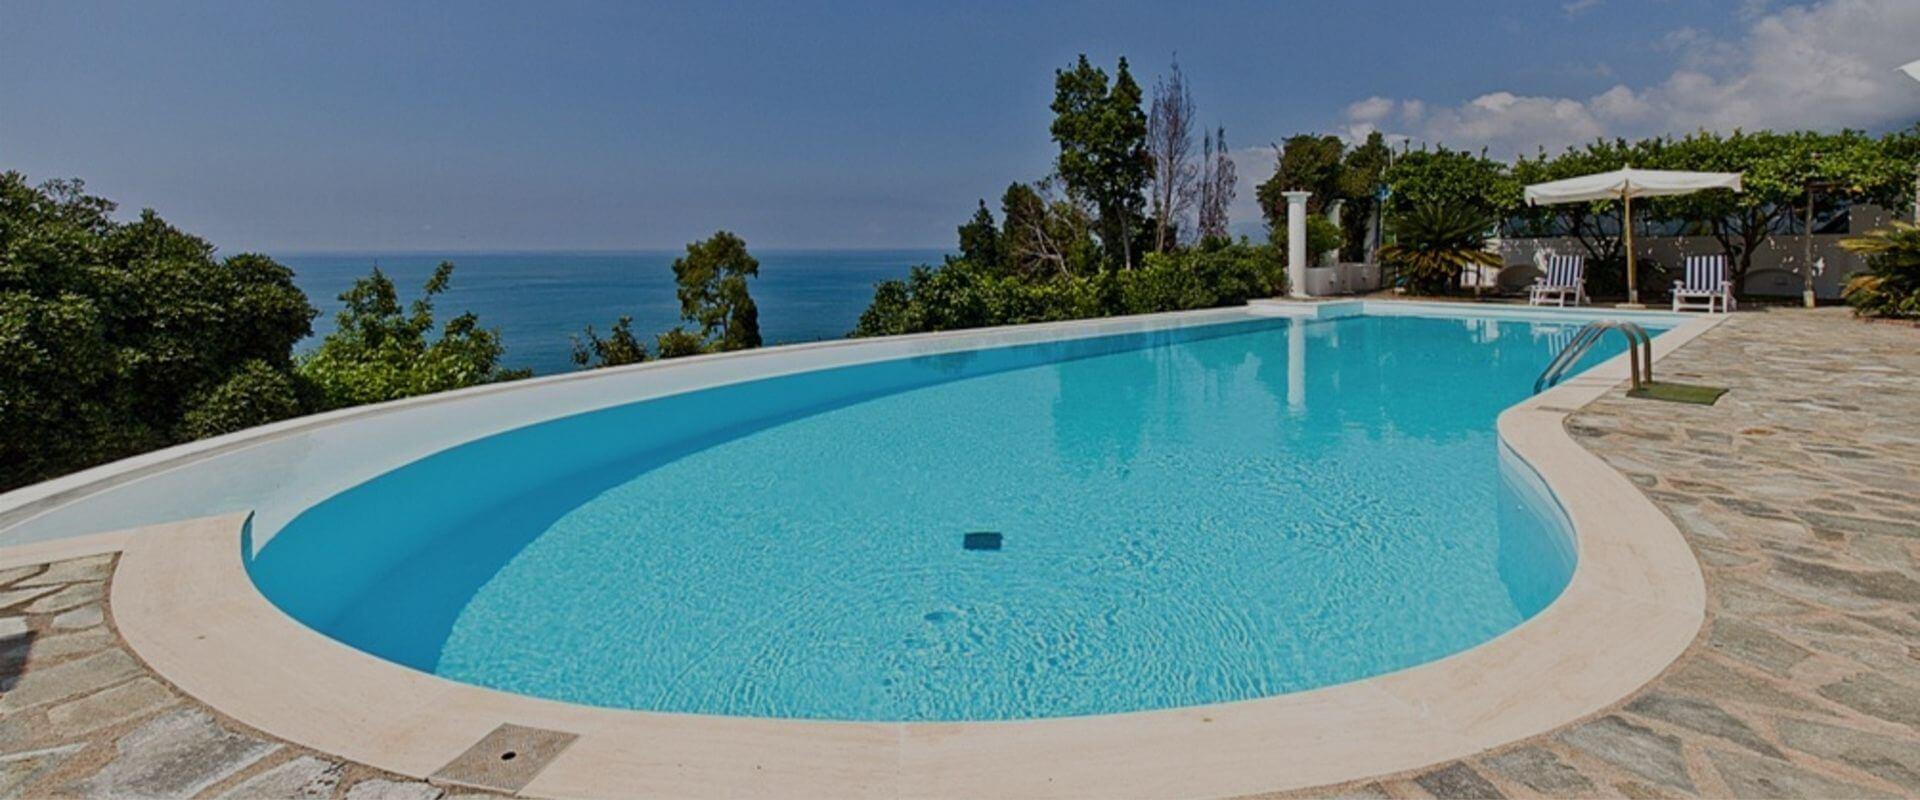 Villa Blanca pool